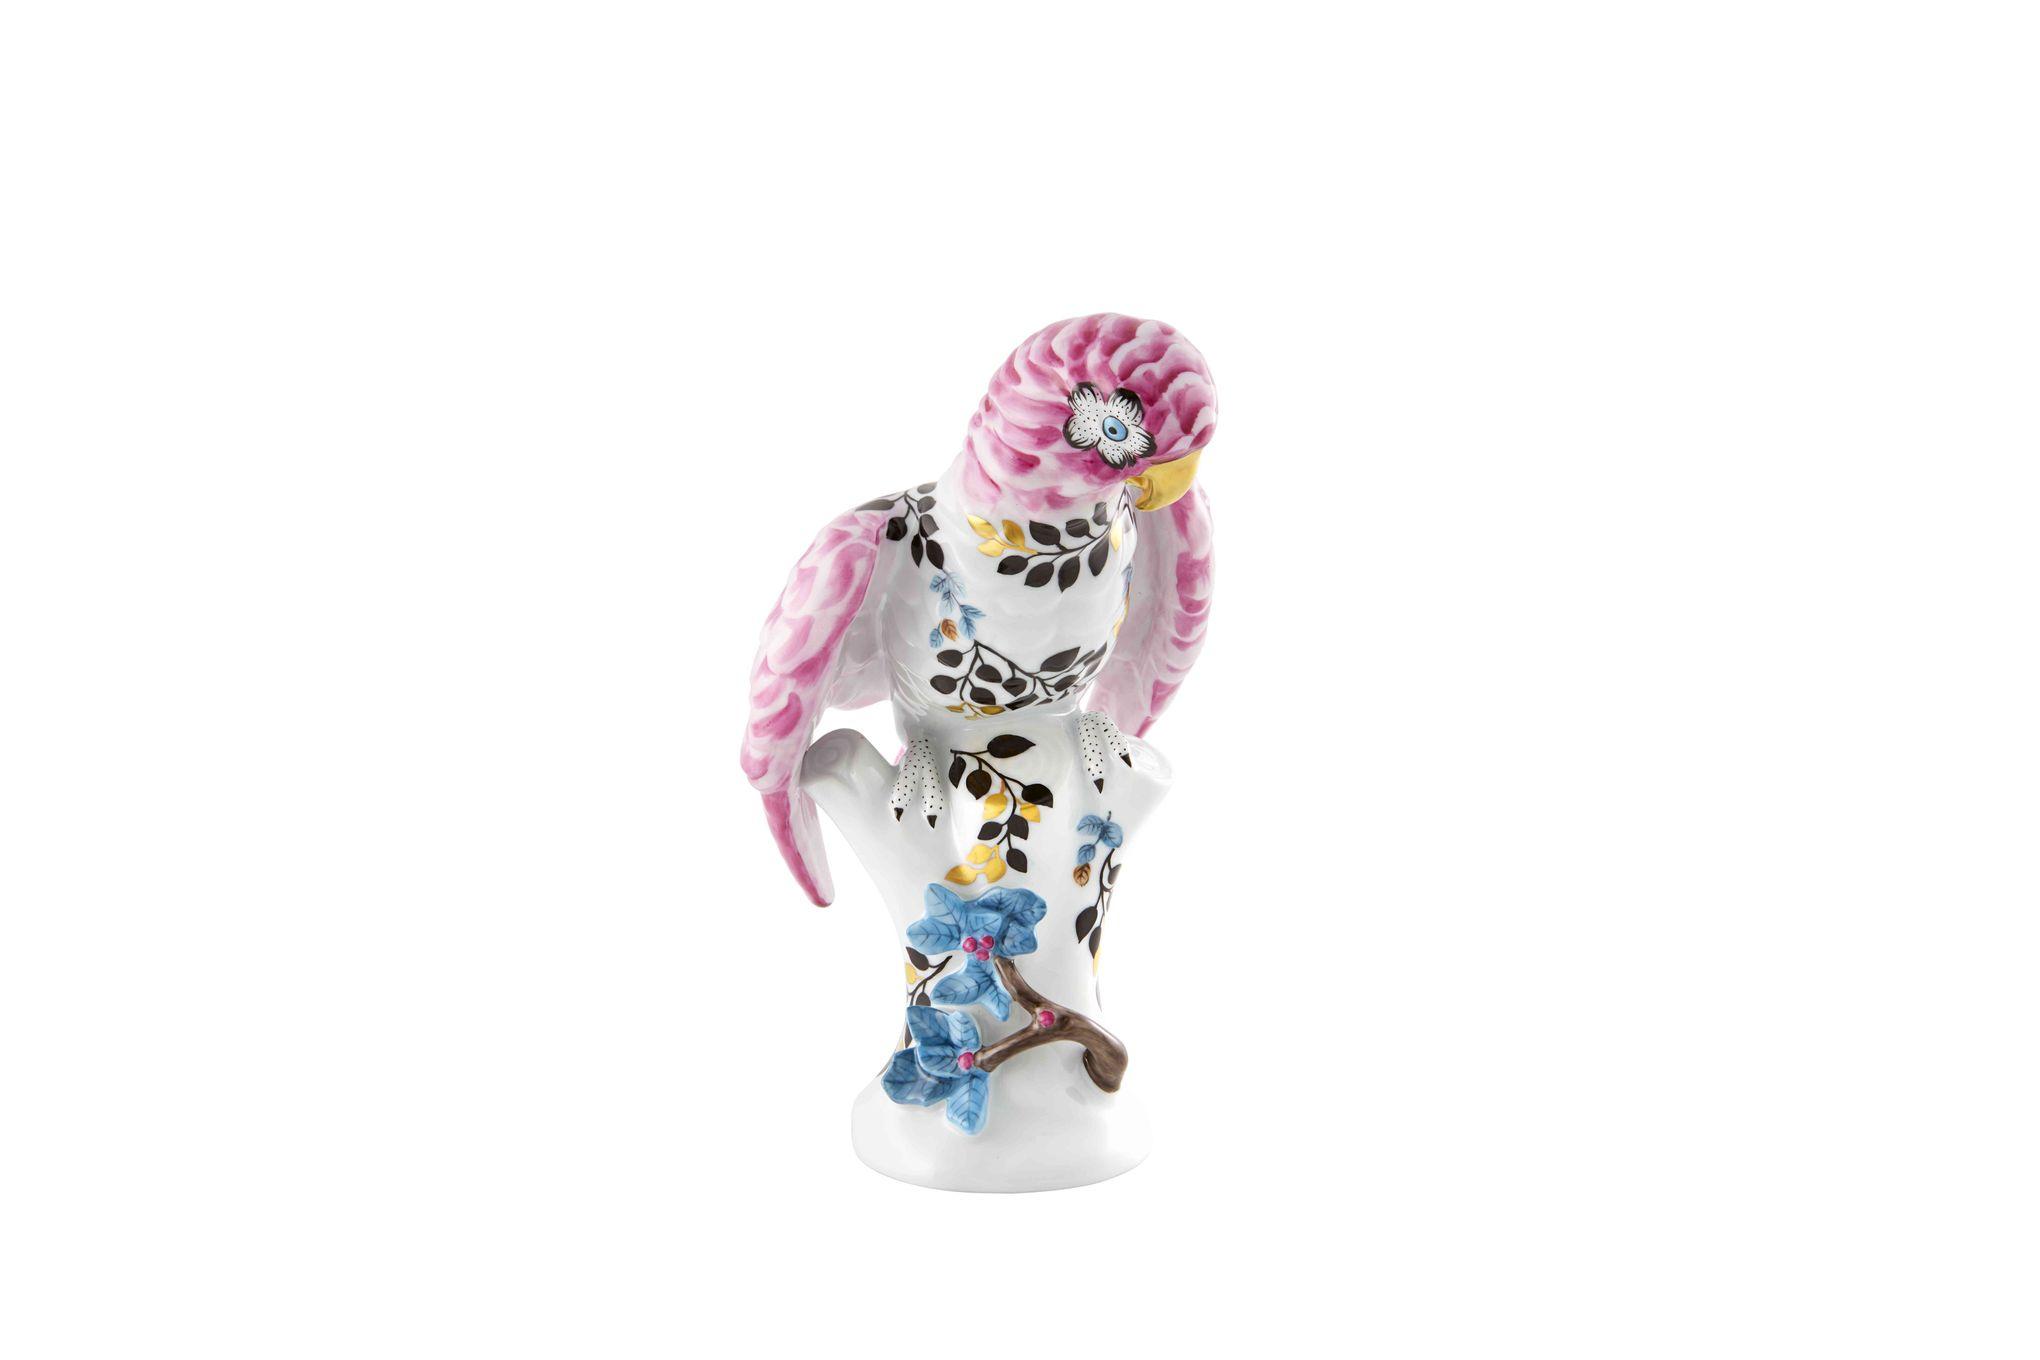 Christian Lacroix Primavera Figurine Parrot thumb 1